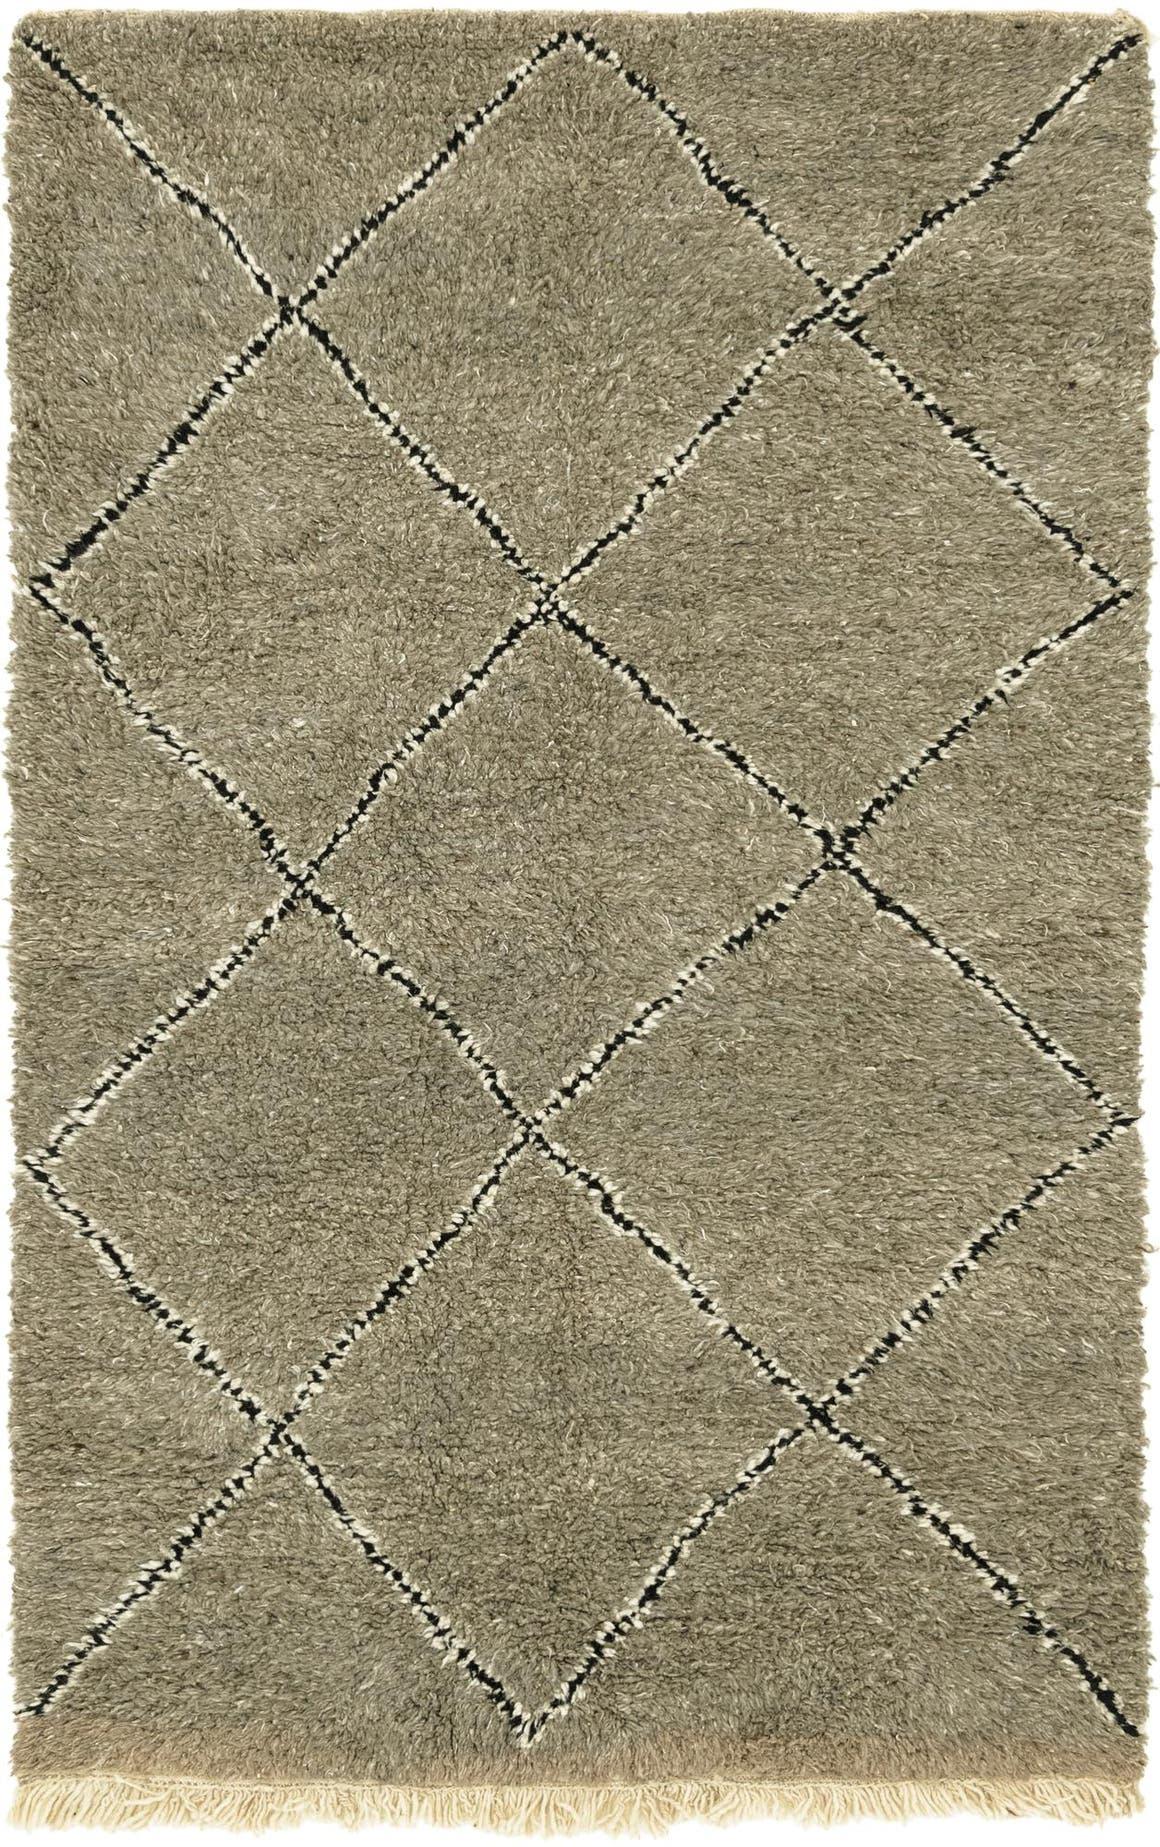 5' x 8' 3 Moroccan Rug main image